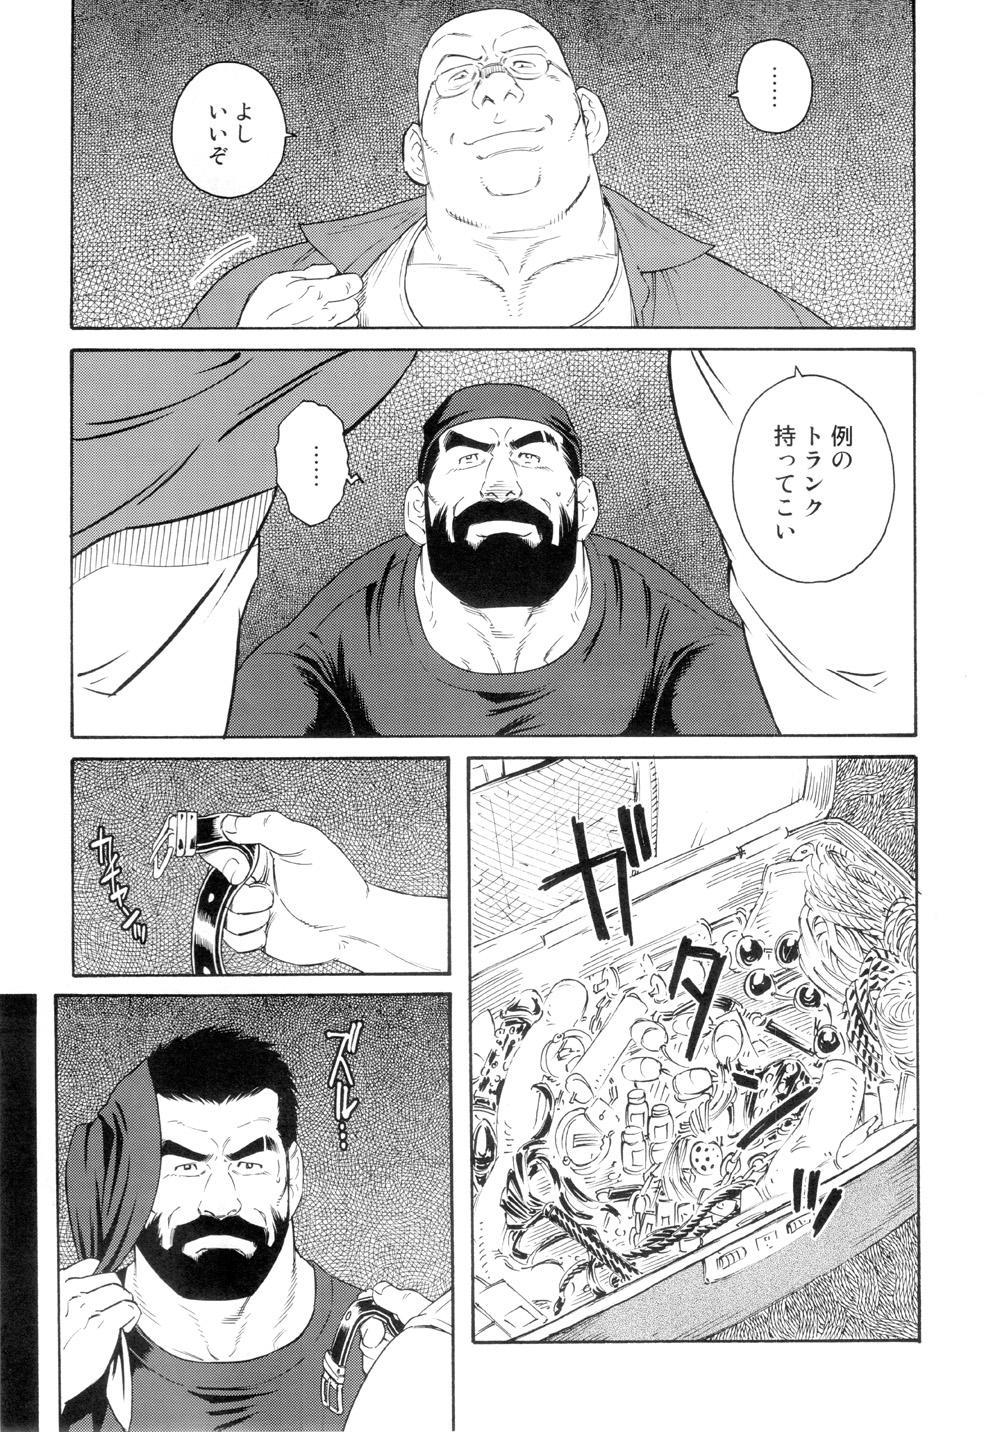 Genryu Chapter 1 6